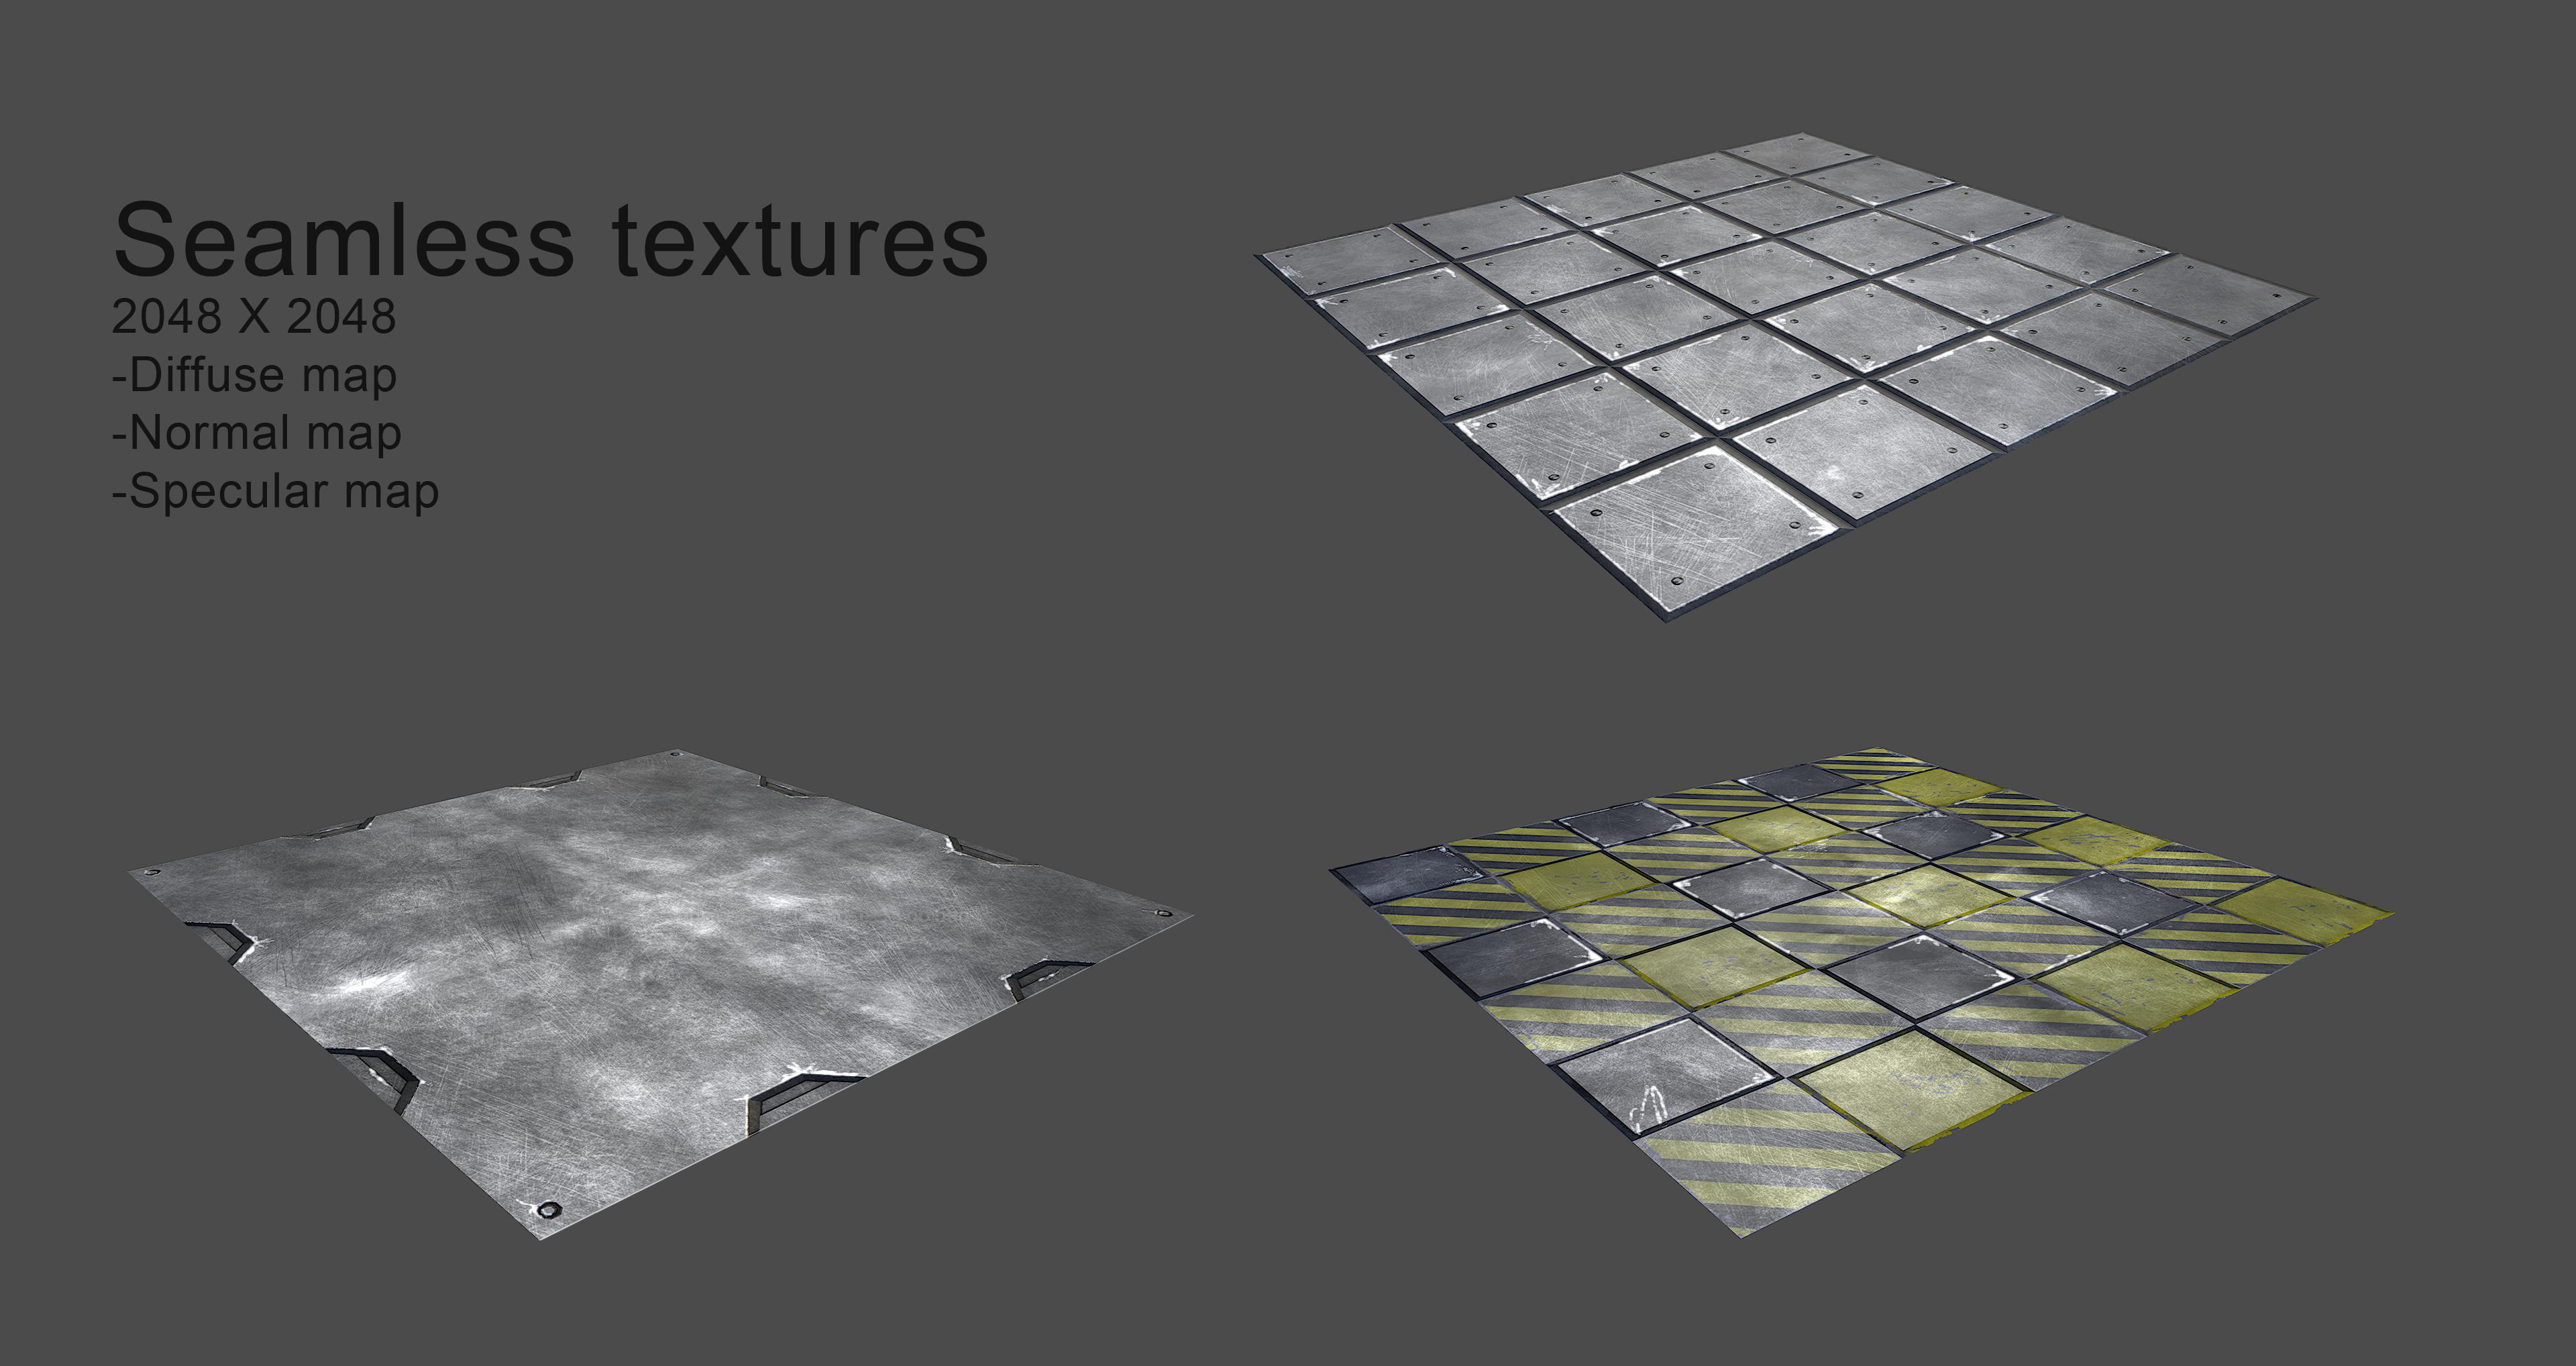 Free Metal Textures pt 1 by jylhis. Free Metal Textures pt 1 by jylhis on DeviantArt